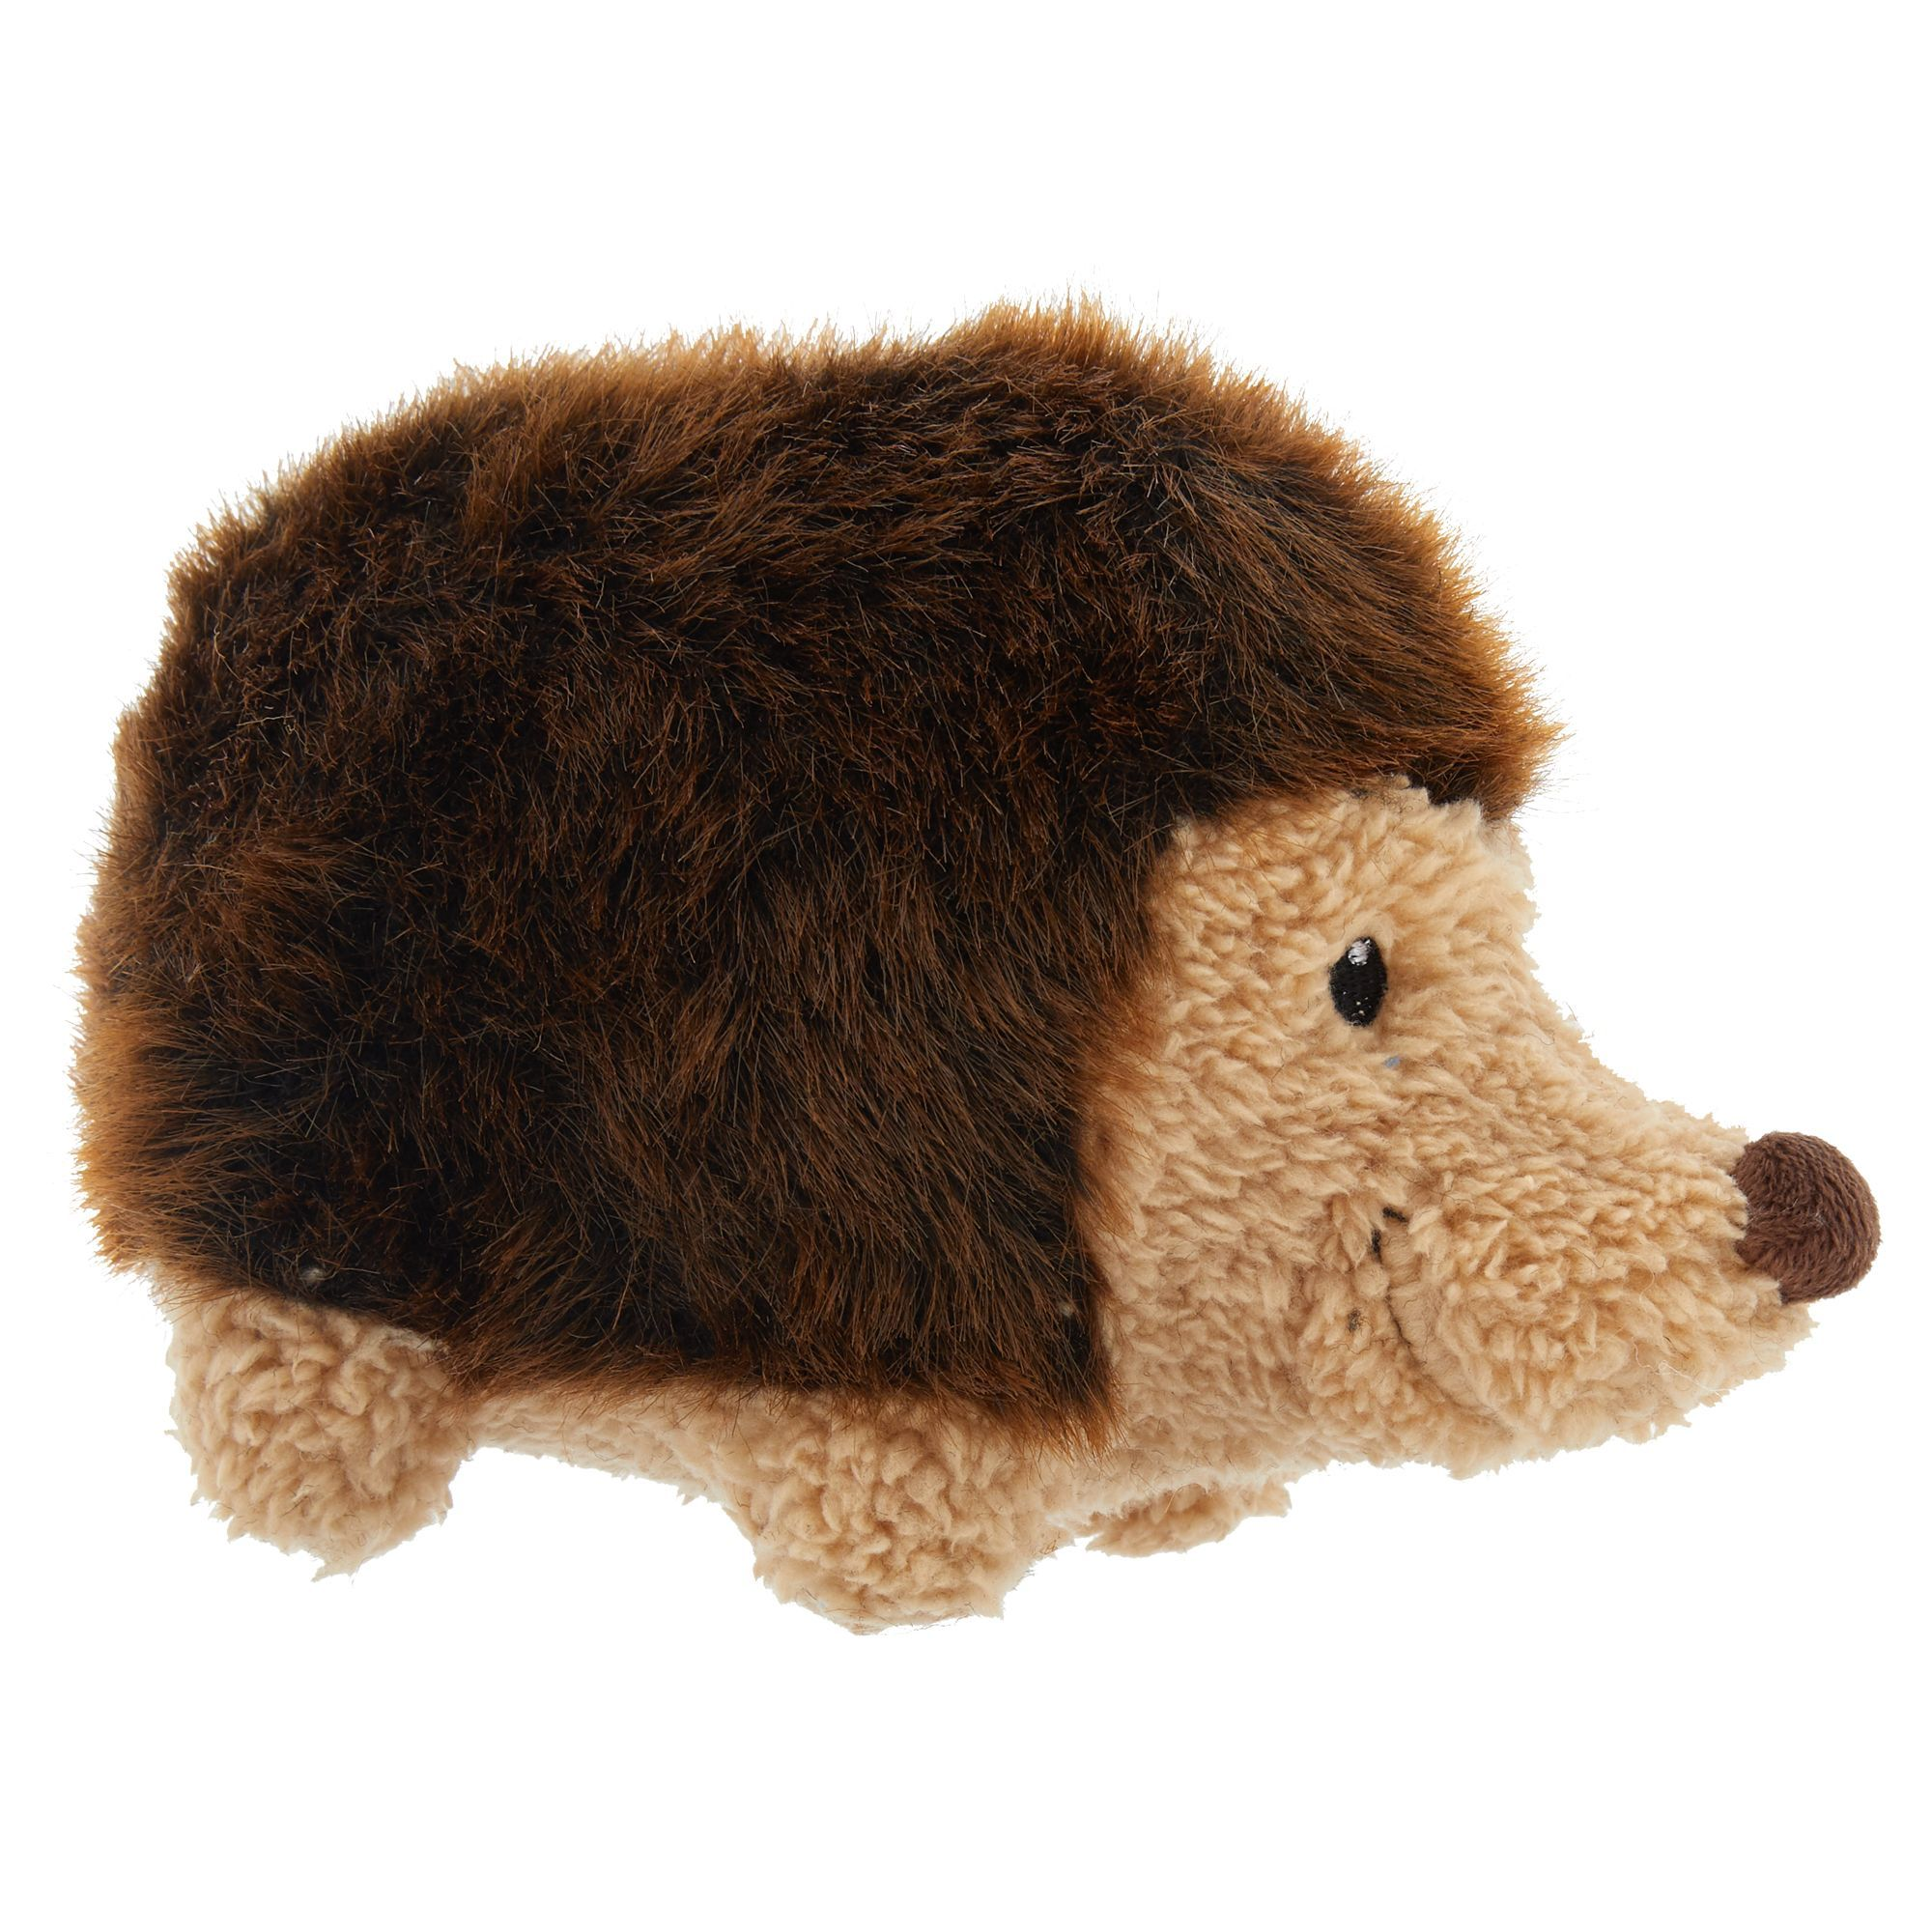 Toys R Us Hedgehog Dog Toy Plush Squeaker Hedgehog